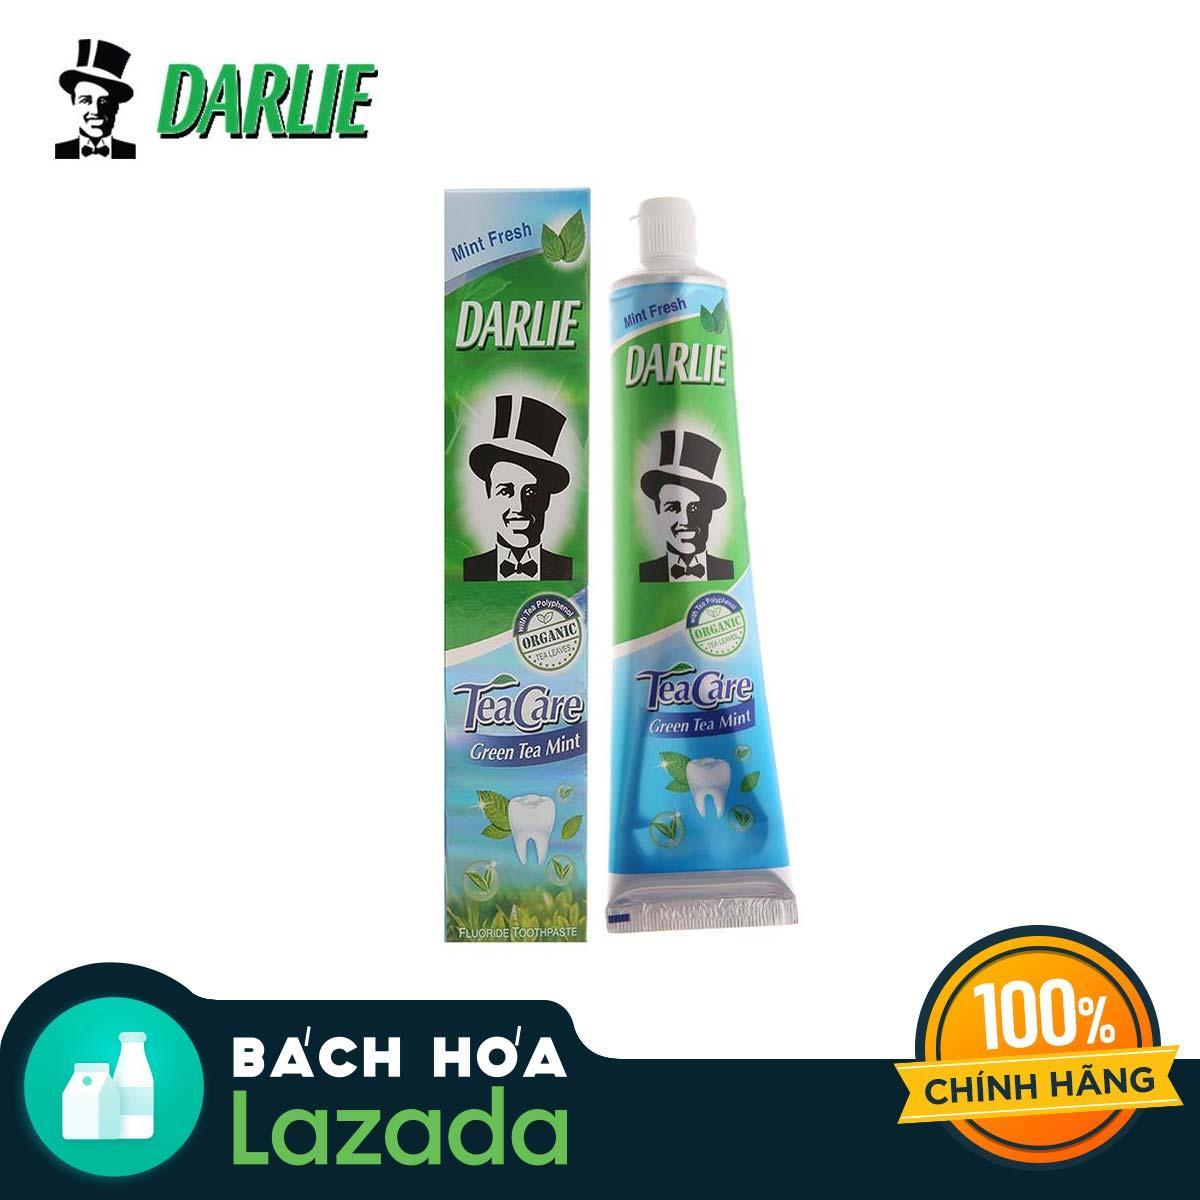 Kem đánh răng Darlie Tea Care Mint 160g